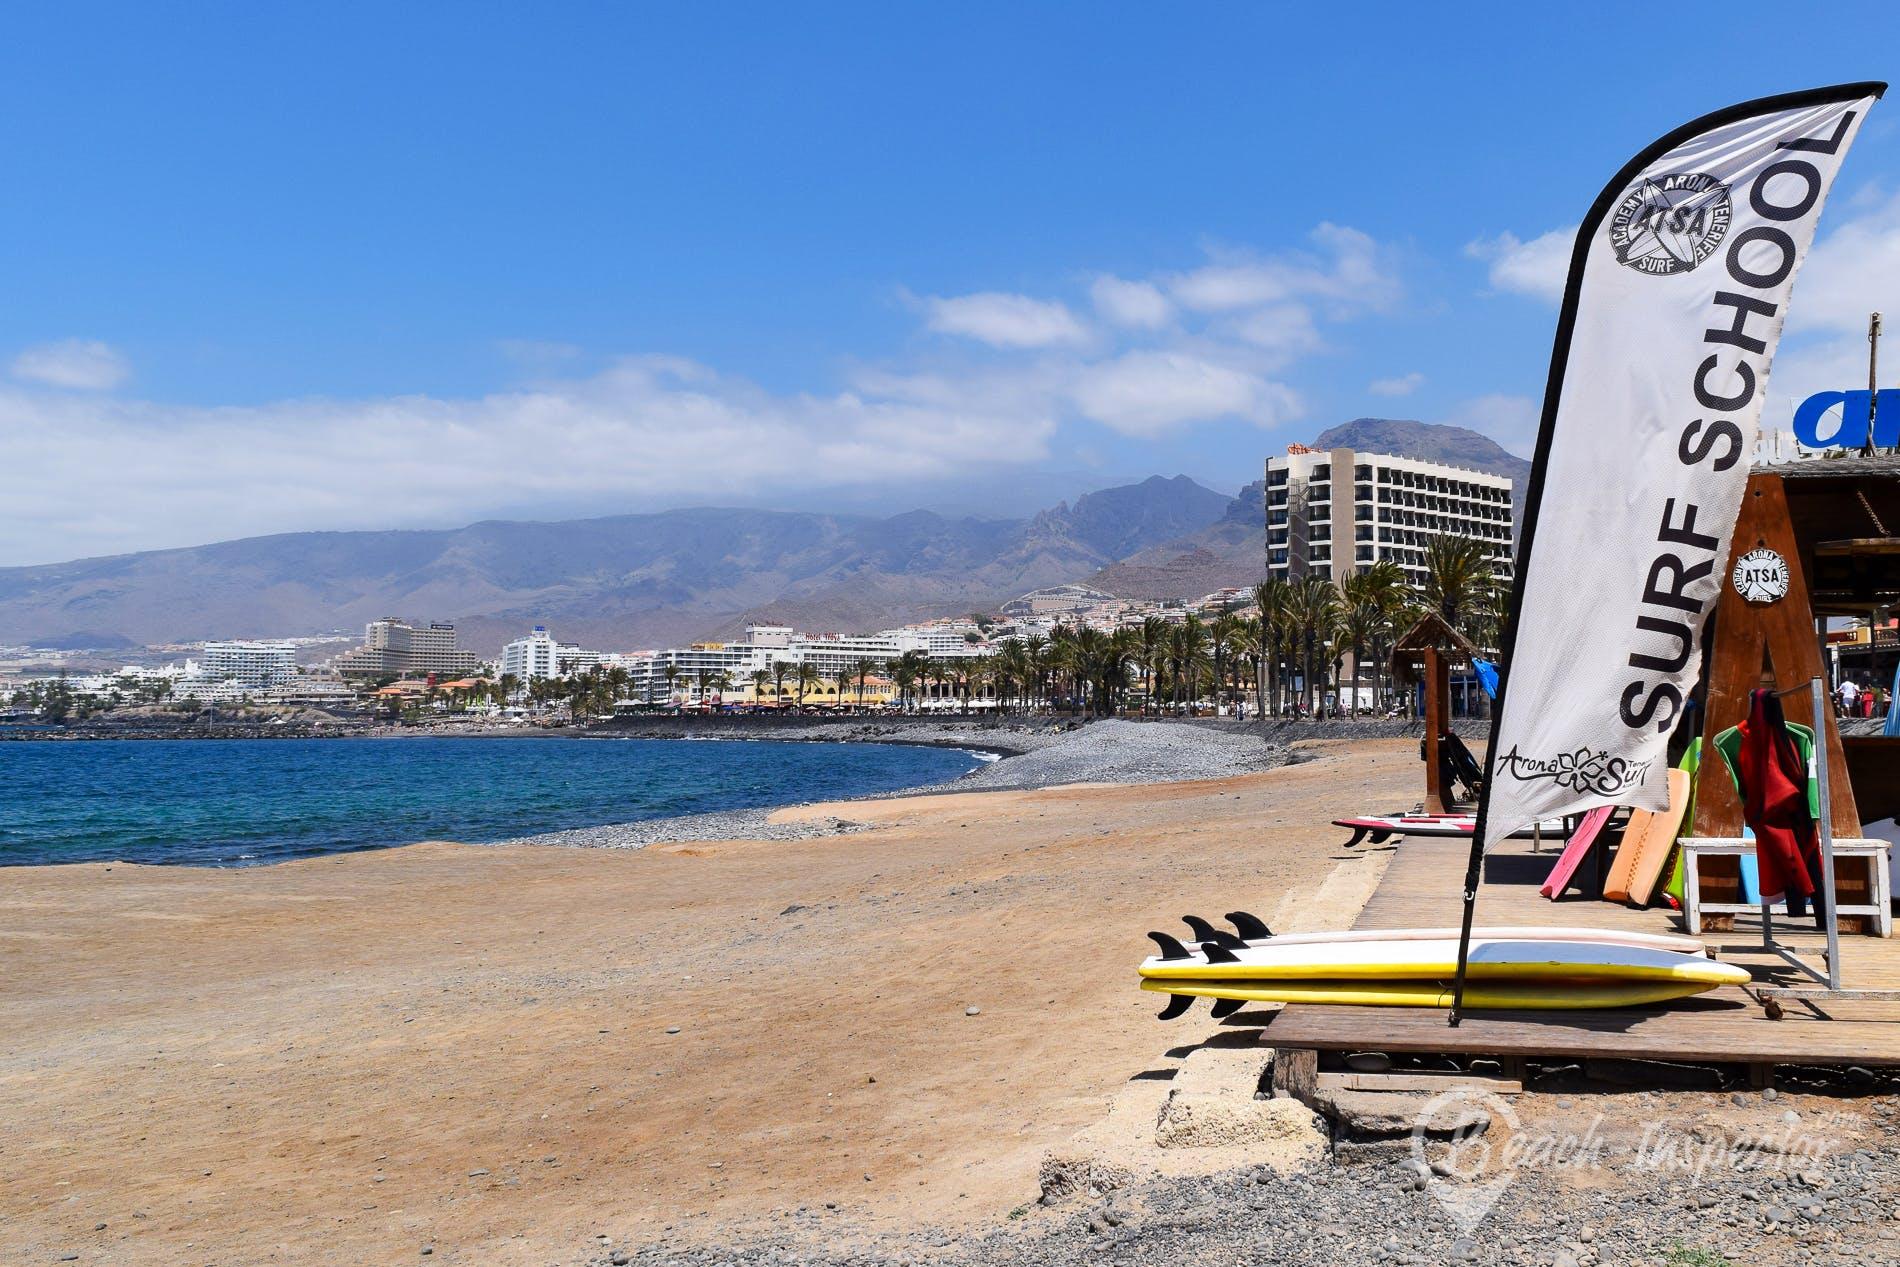 Beach Playa Honda, Tenerife, Spain